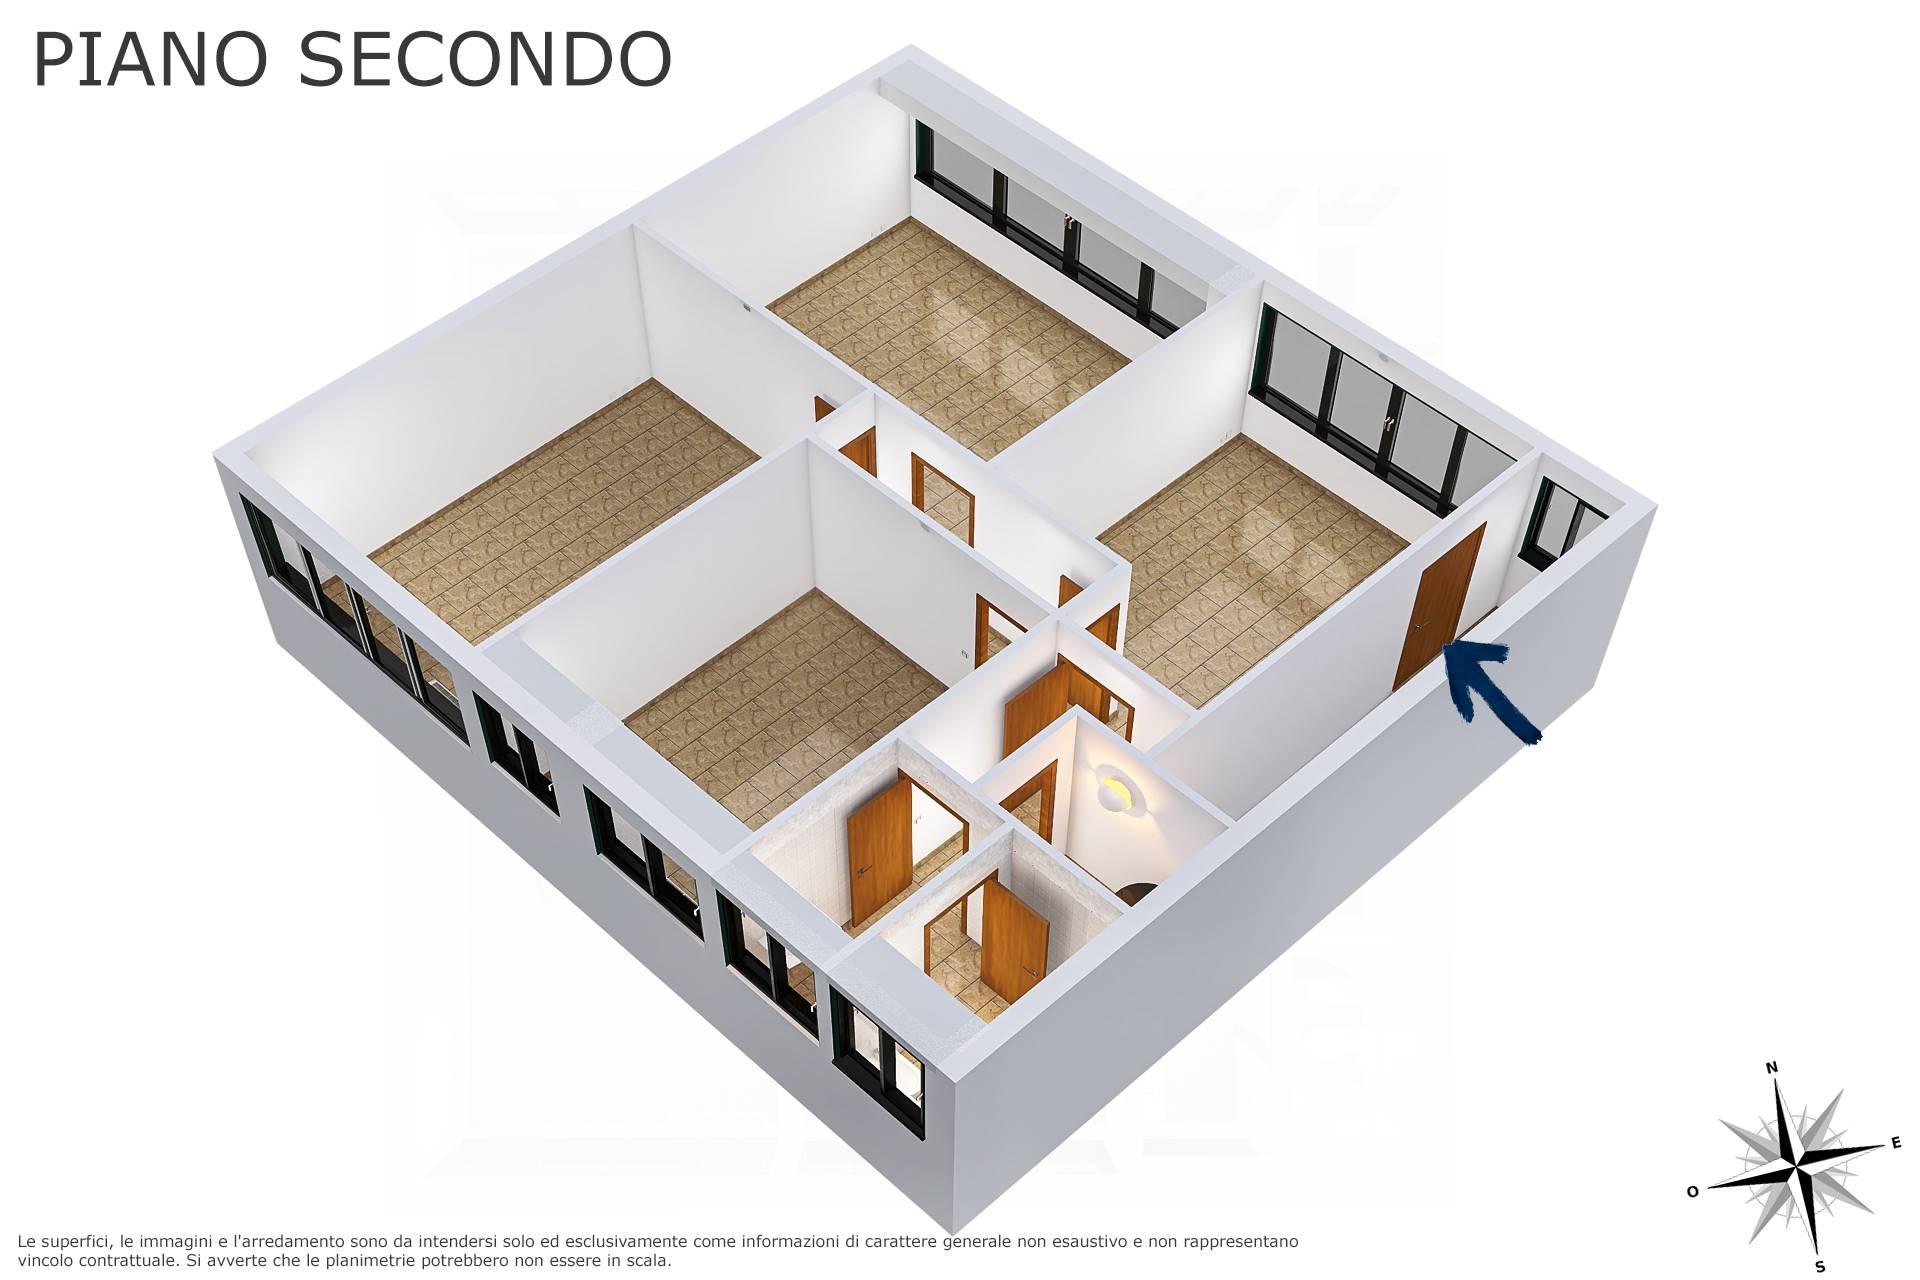 Planimetria 3D lato scala a due